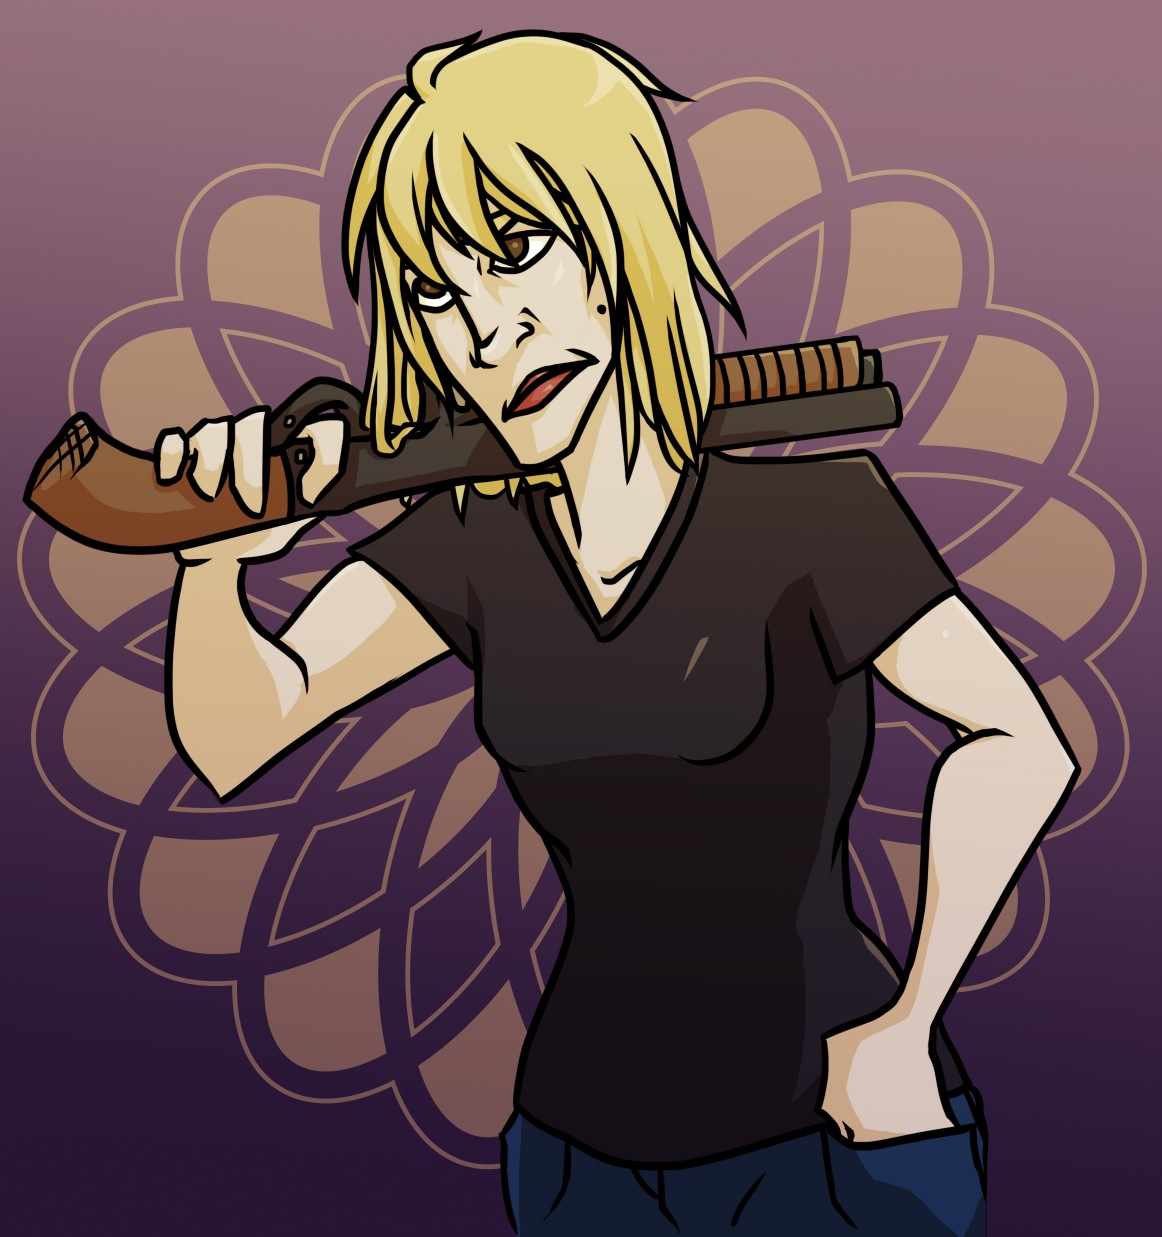 Lady with a Shotgun